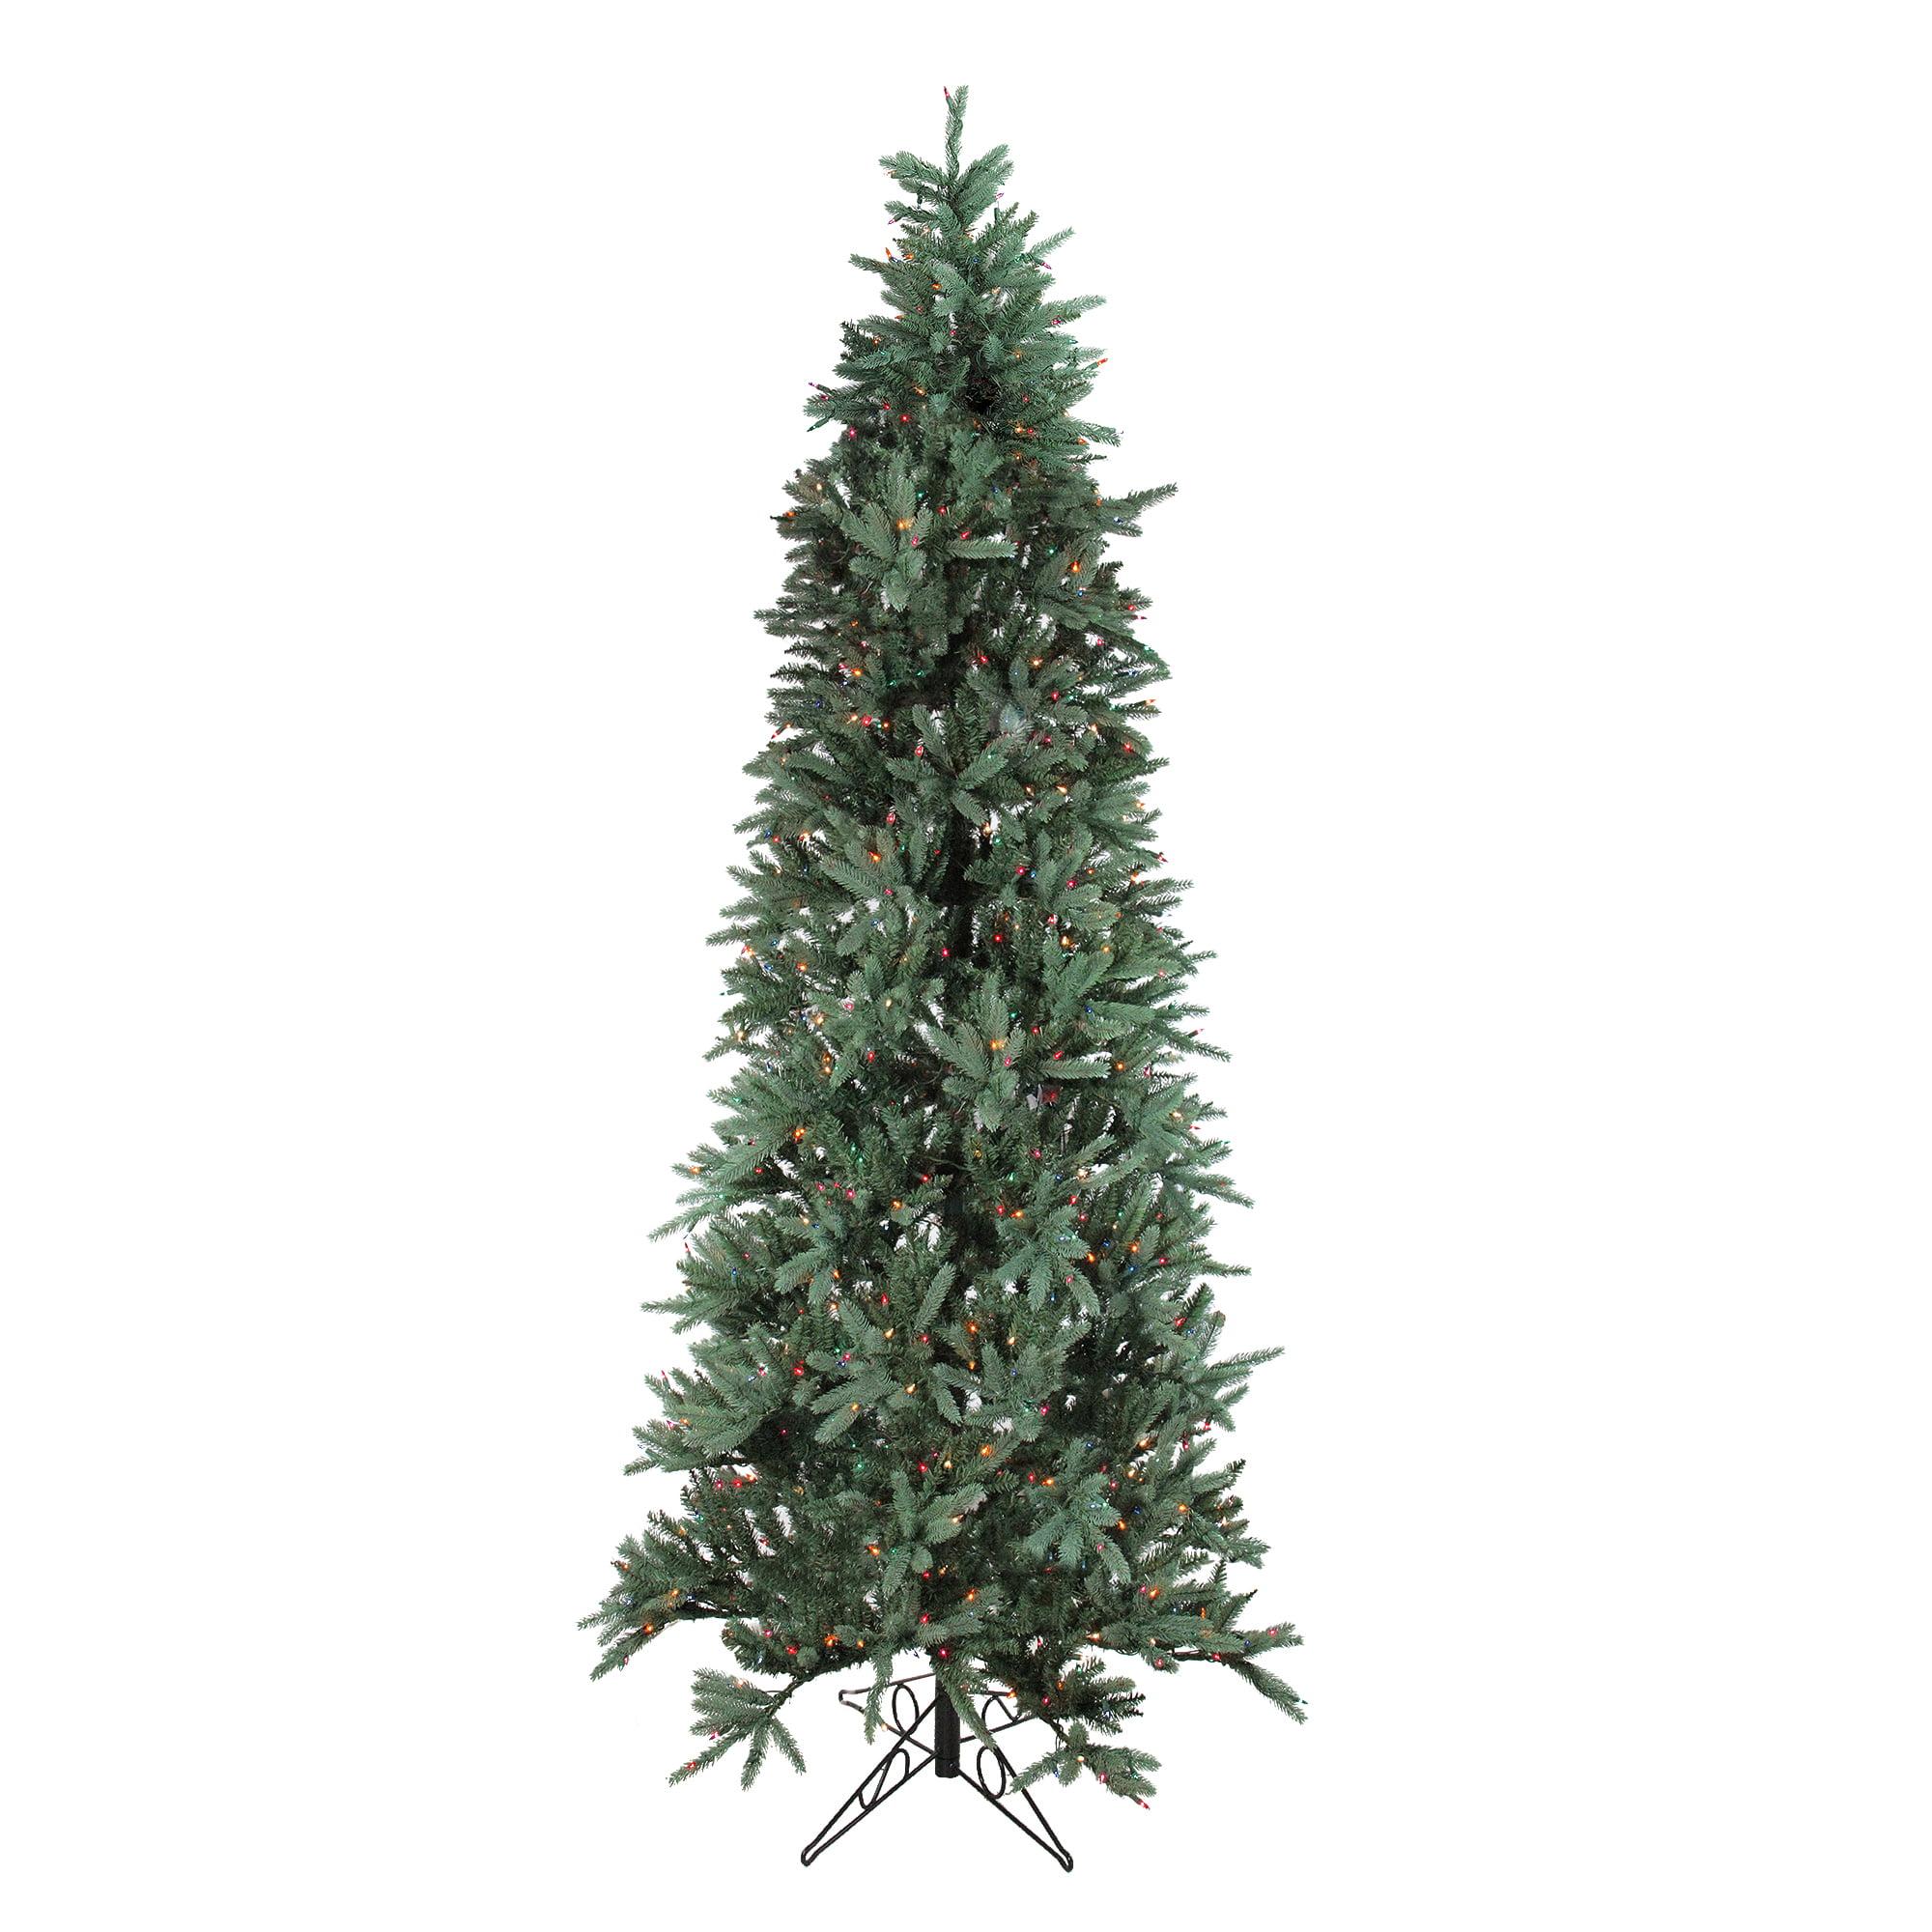 Where To Cut Christmas Trees: 9' Slim Fresh Cut Carolina Frasier Artificial Christmas